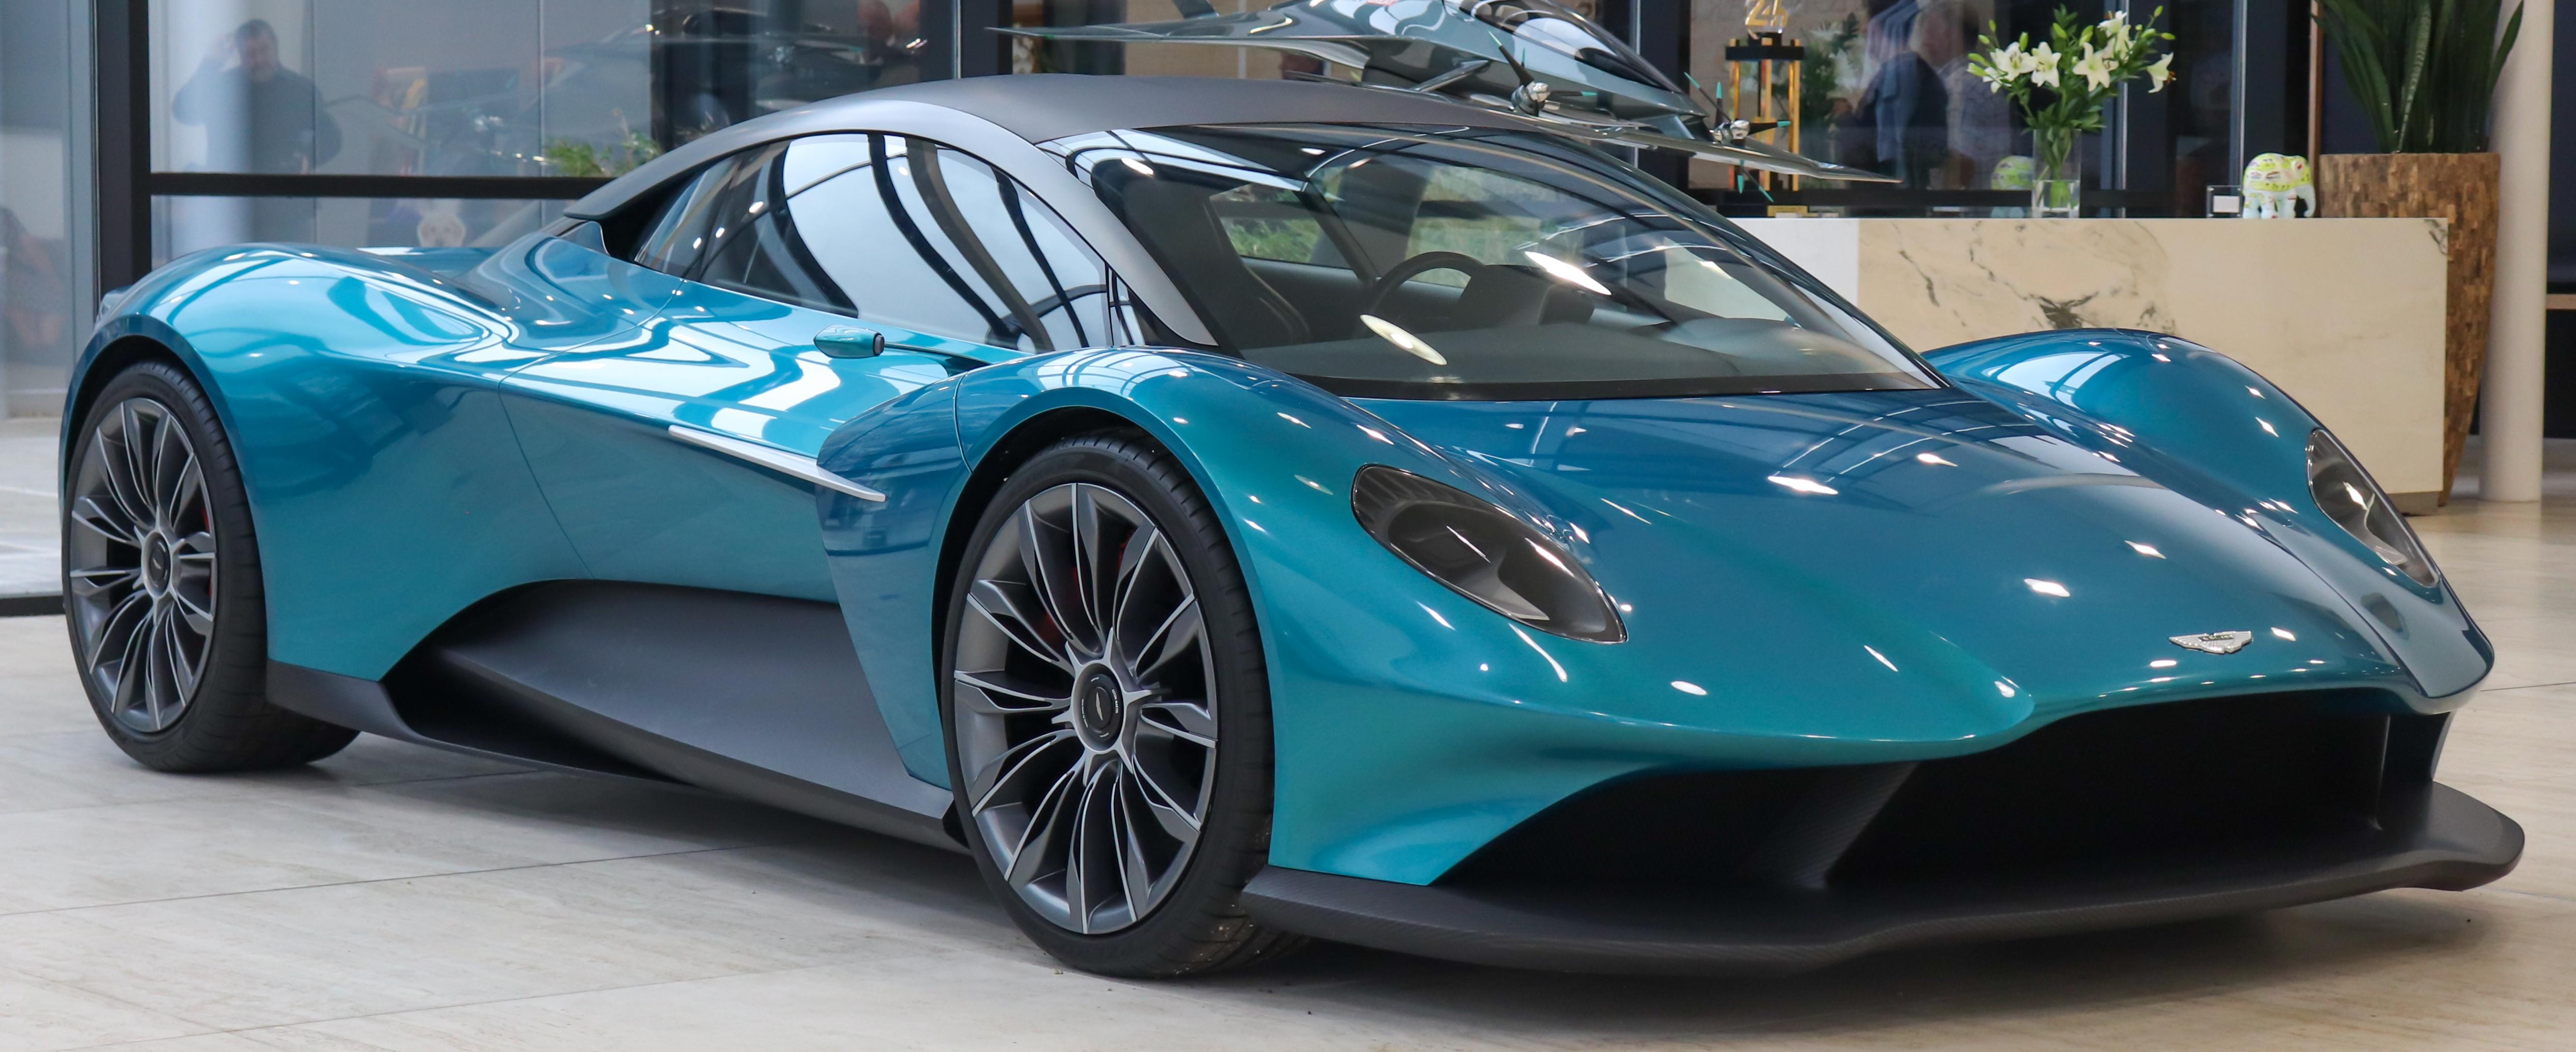 File 2019 Aston Martin Vanquish Vision Concept 6 5 Jpg Wikipedia